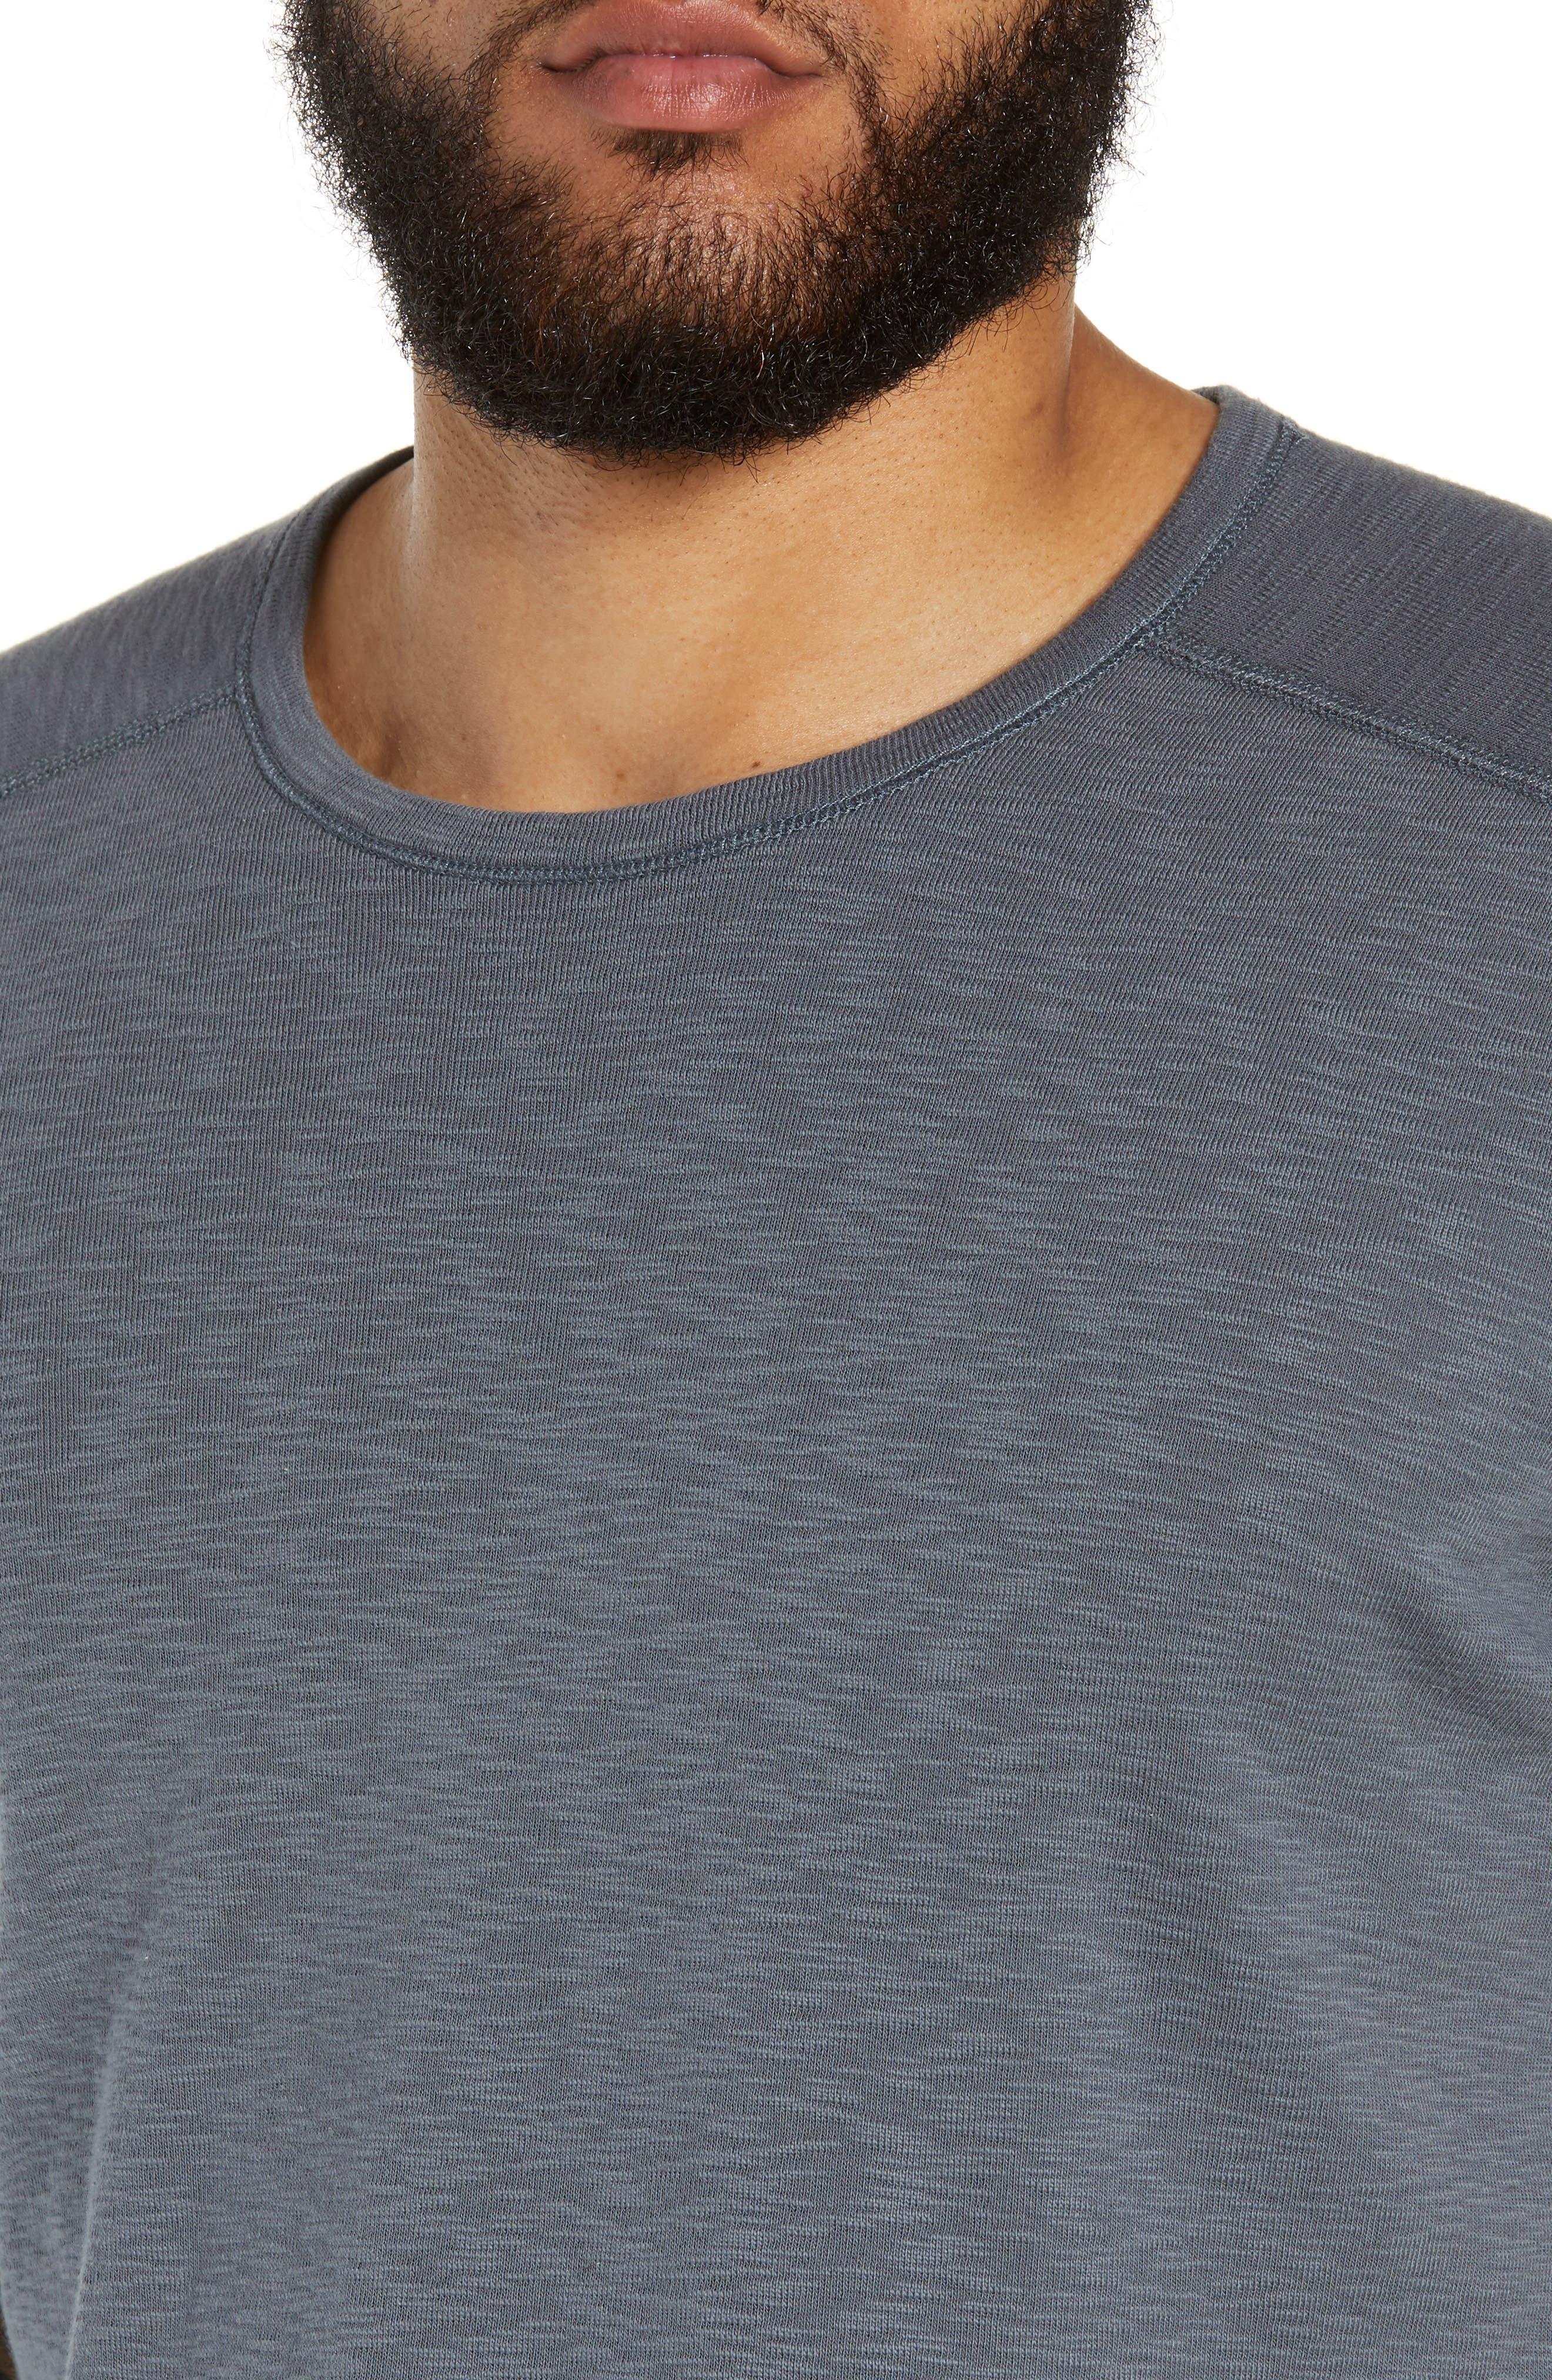 WINGS + HORNS, Ribbed Slub Cotton T-Shirt, Alternate thumbnail 4, color, SHADOW